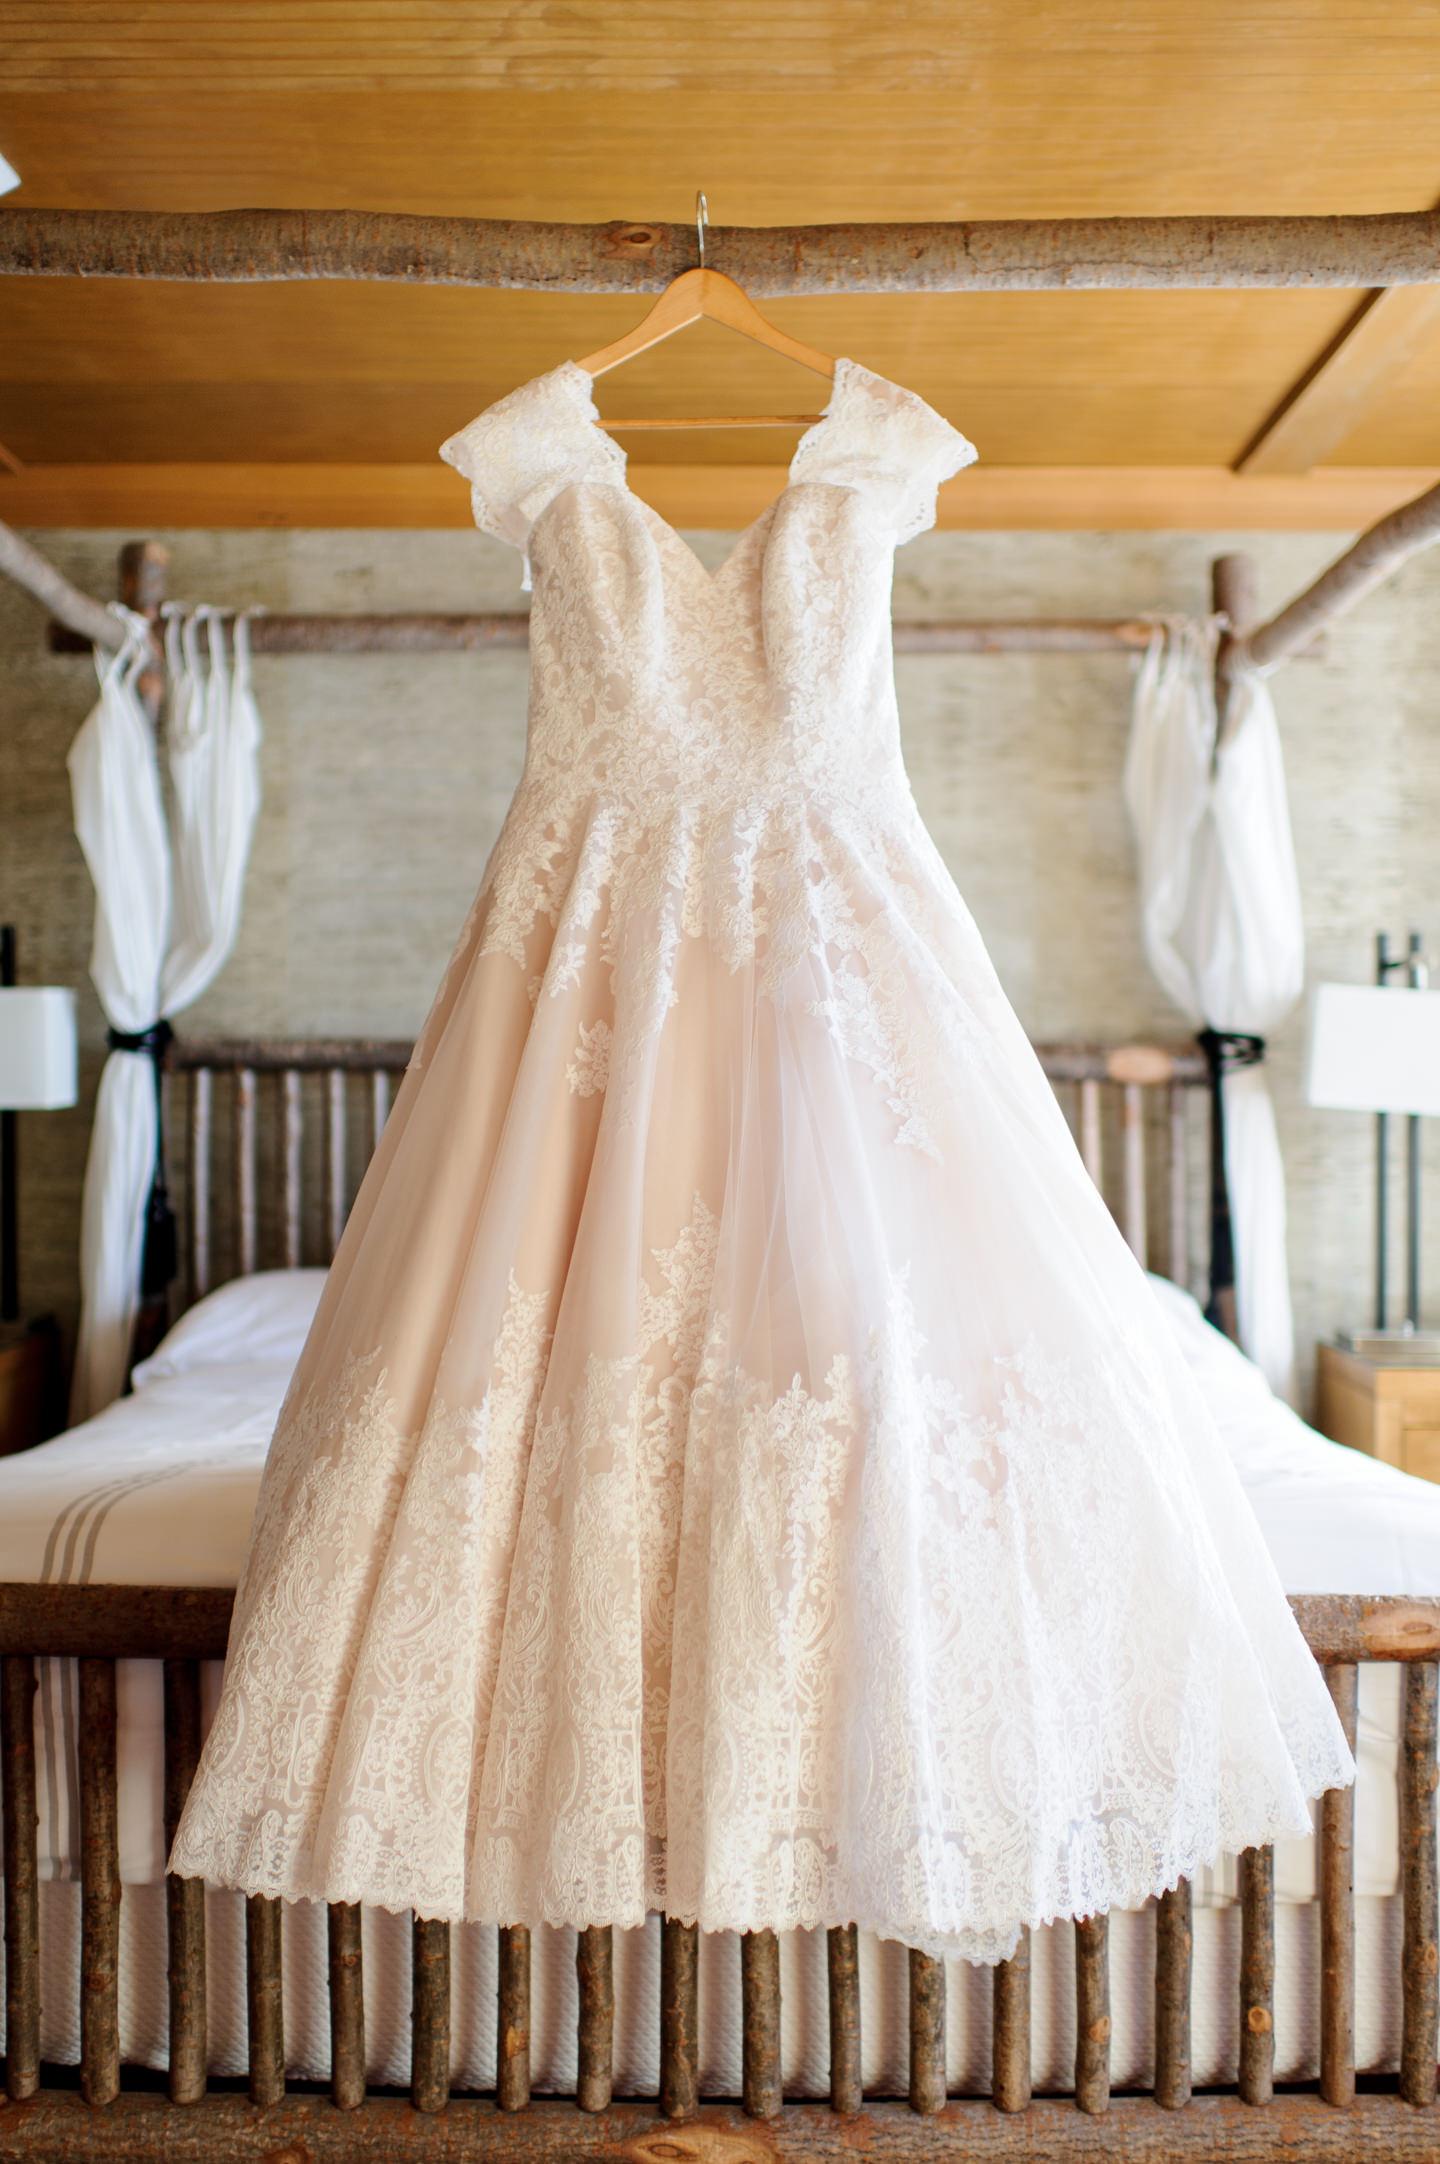 Wedding Dress Details at Edgewater Hotel